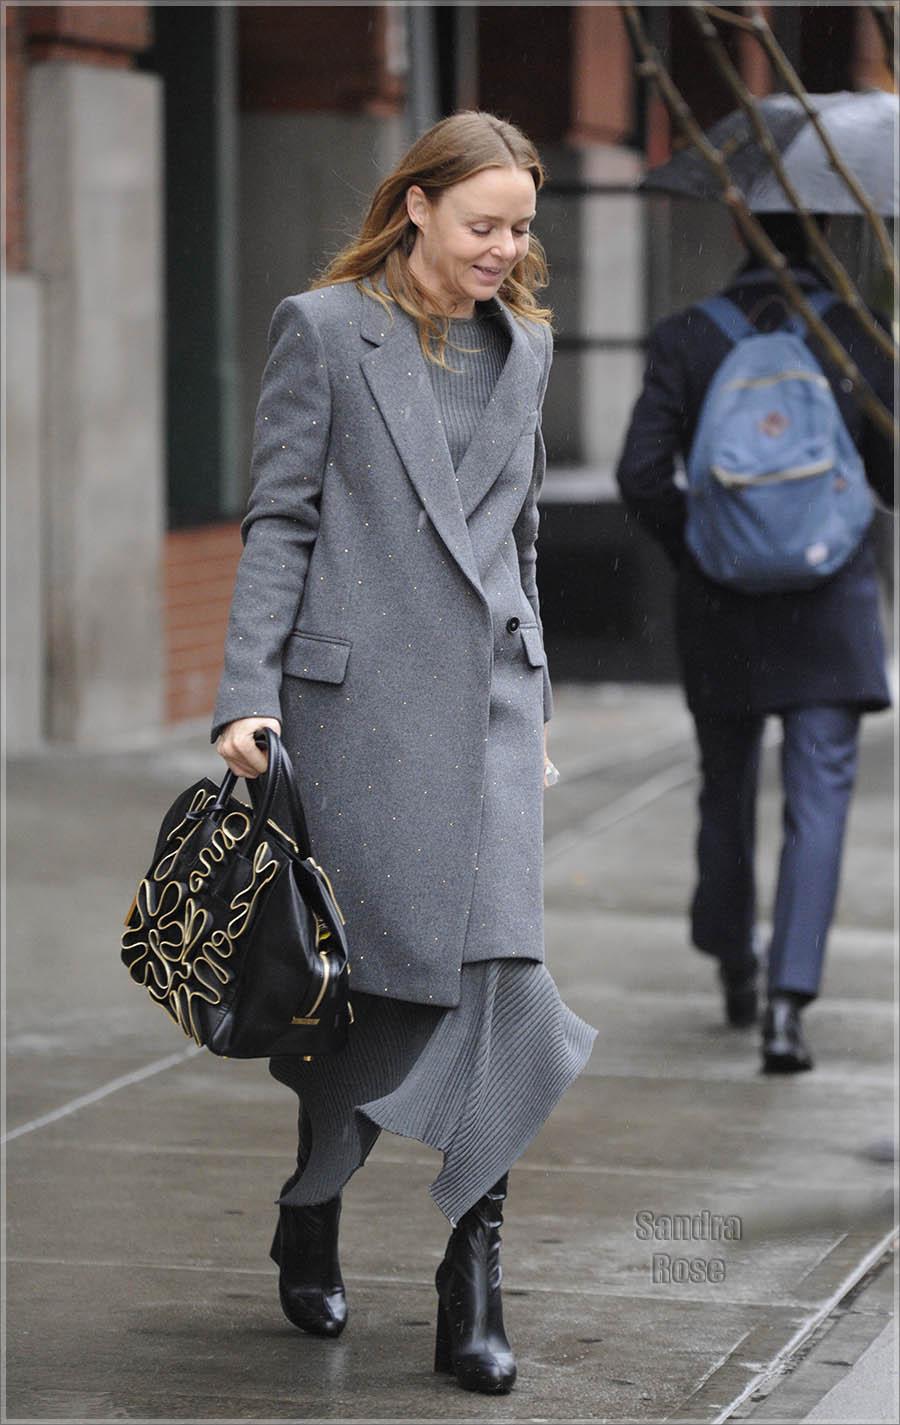 Stella McCartney leaving her hotel in New York